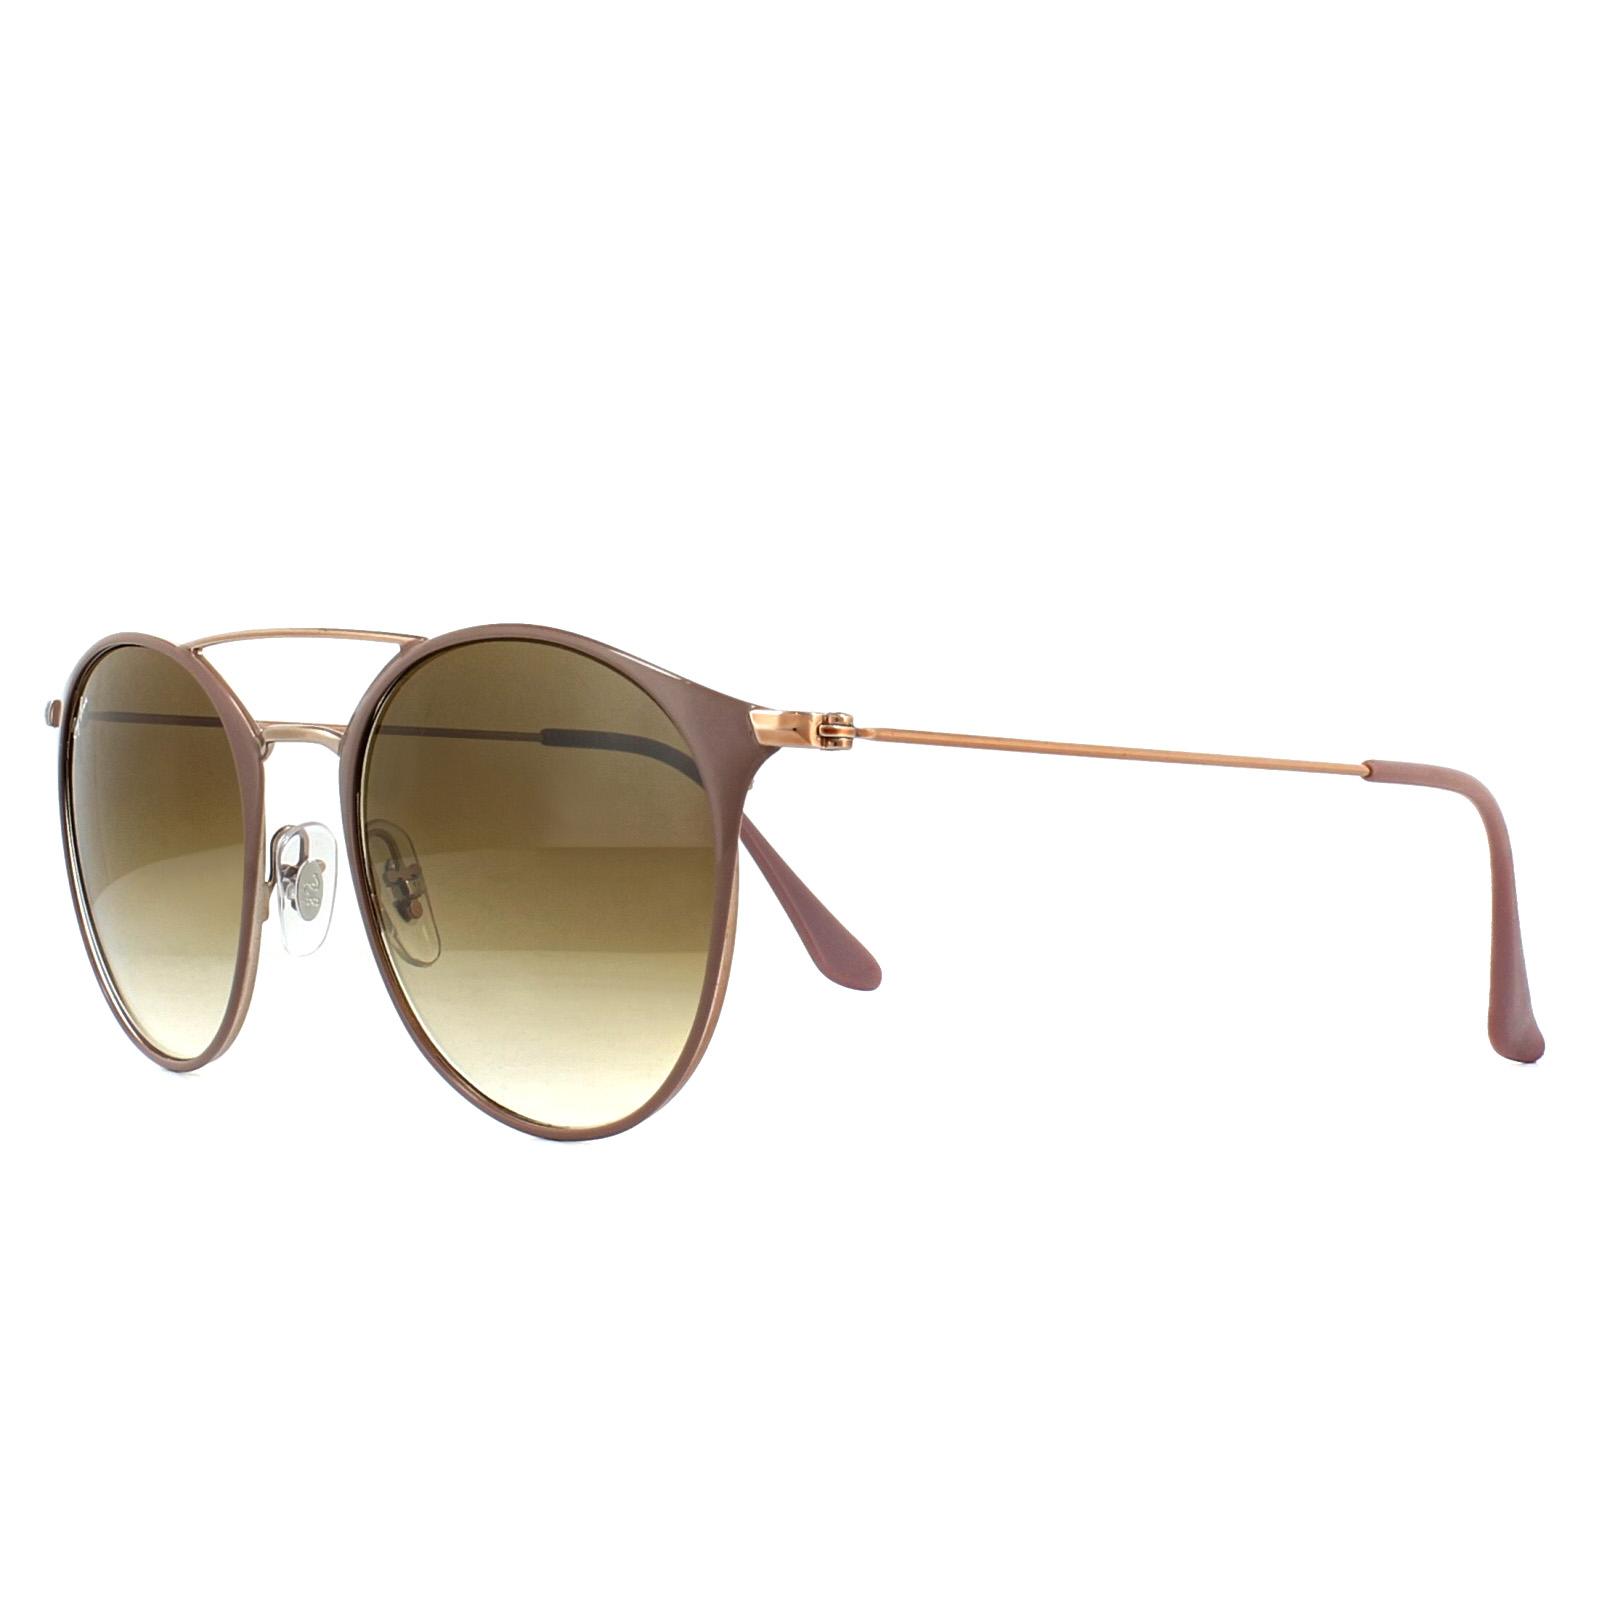 b554b18344ea6 Ray-Ban Sunglasses 3546 907151 Brown Bronze Copper Light Brown ...